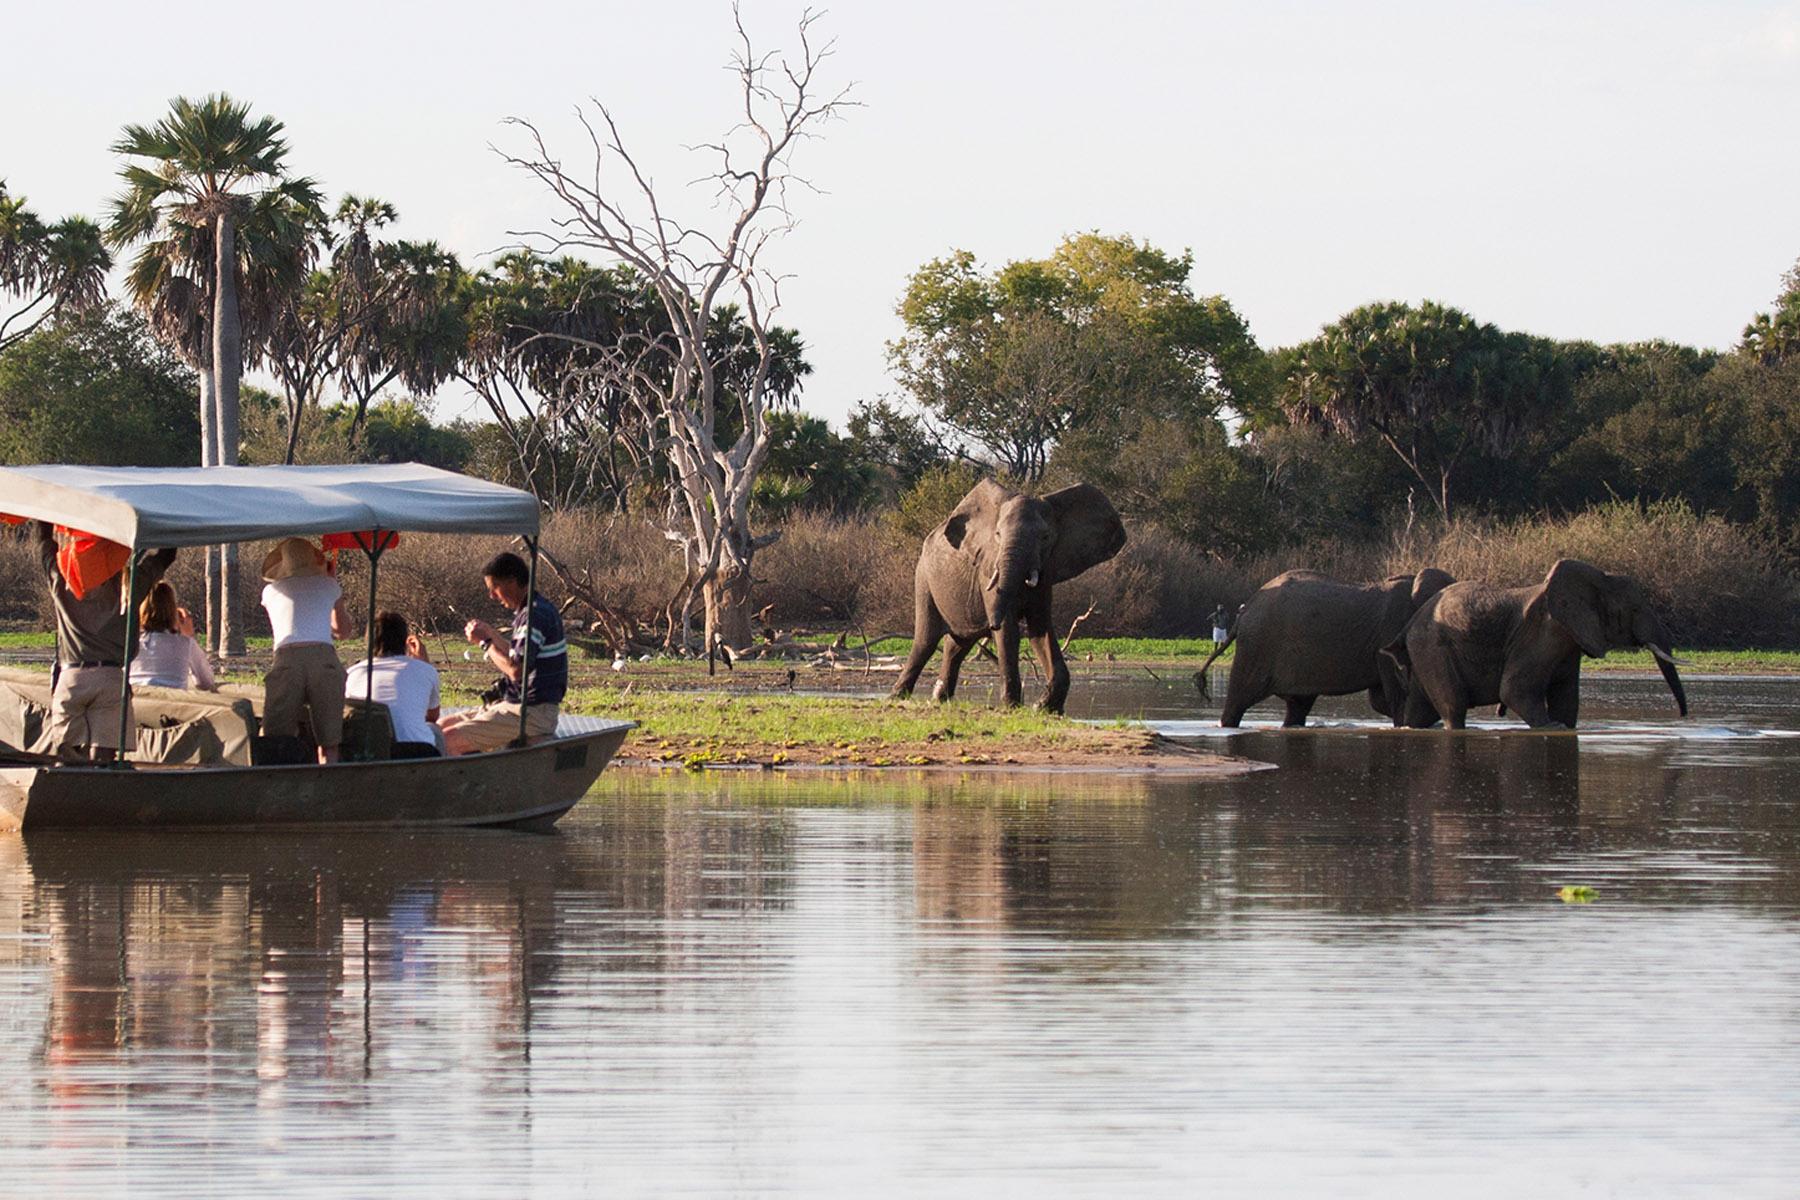 Nzerakera lake, Selous Game Reserve / Tanzania  January 25th 2007: Tourists watching a herd of elephants drinking while on a boat safari.